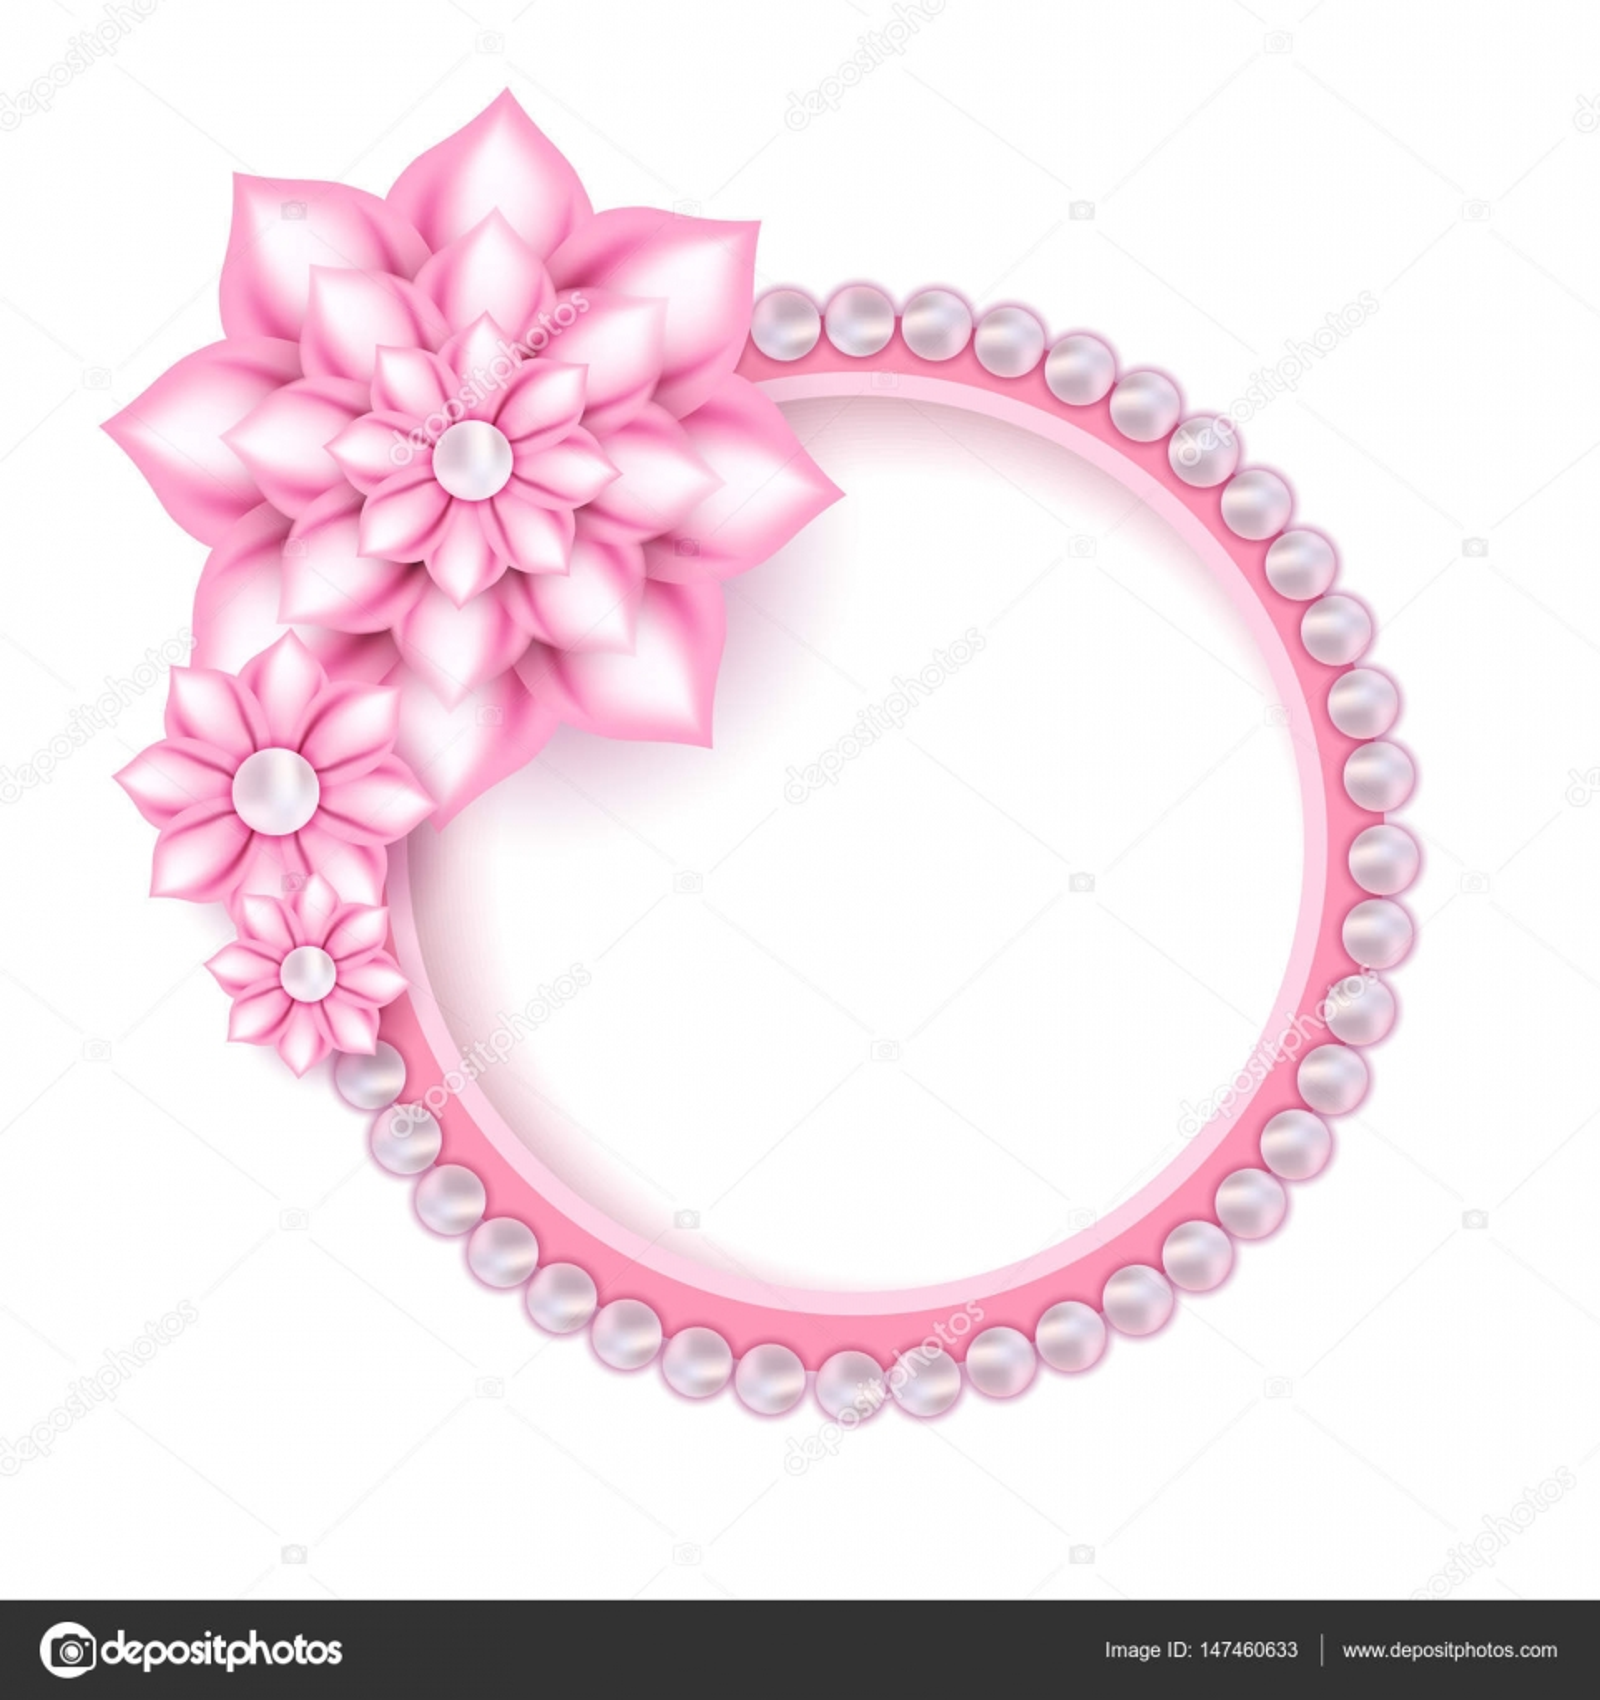 Schmuck rosa Perle Rahmen für Foto — Stockvektor © Peliken #147460633